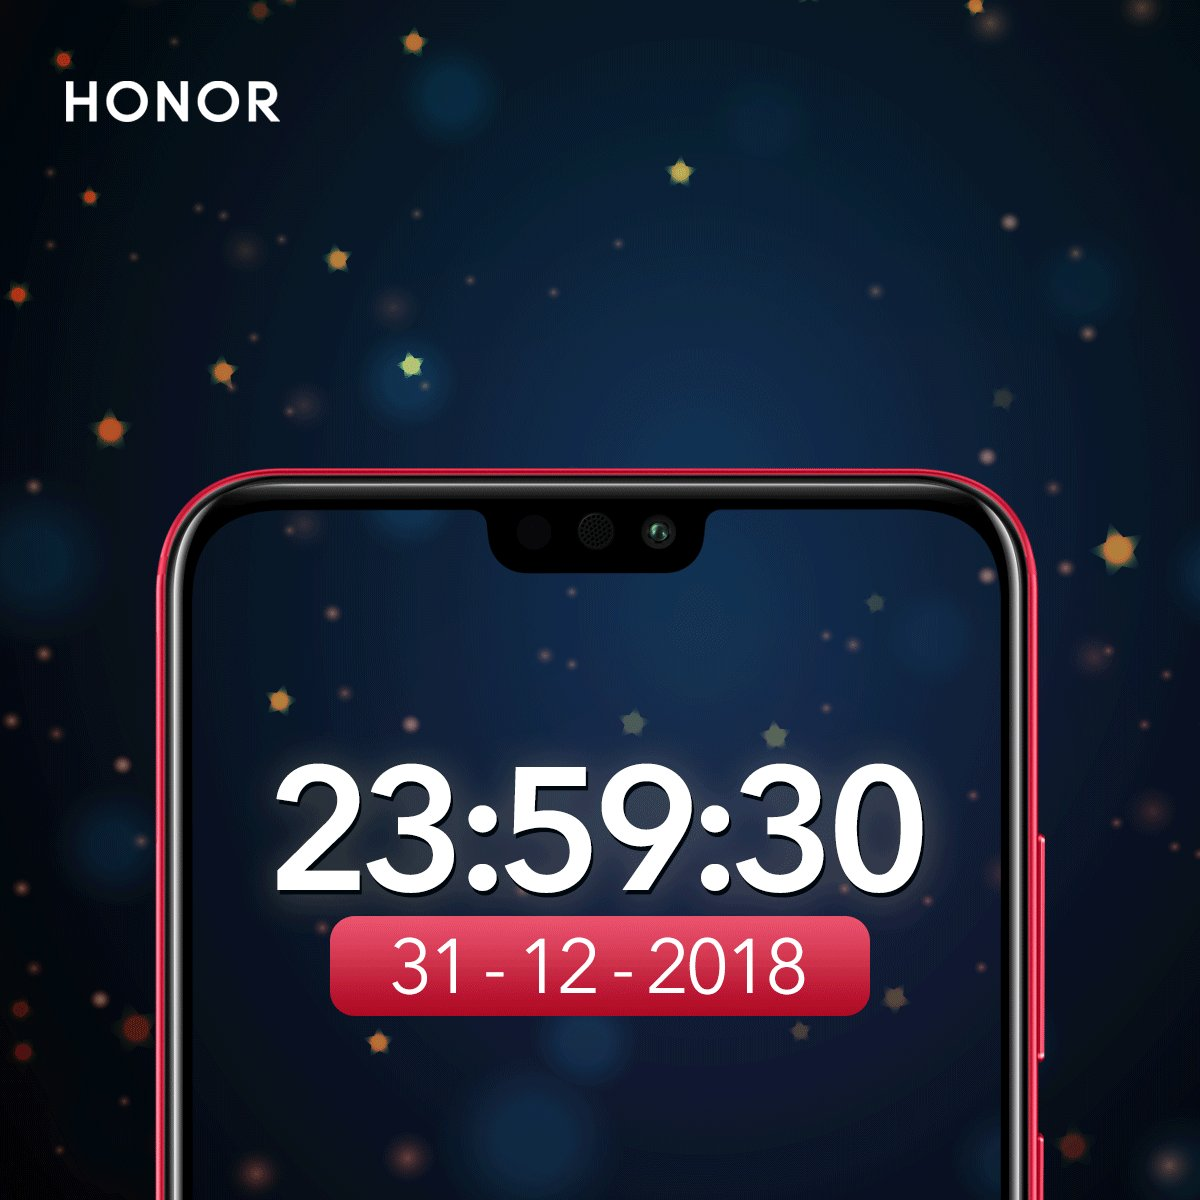 Hai HONOR Fans, Selamat tahun baru 2019!  Yuk Share screenshot 00:00:00 kamu dibawah komen ini!  Kalo kamu berhasil screenshot 00:00:00, kamu akan dapatkan HONOR New Year bleesing 🎉🎉🥳🥳 #HONORIndonesia #HONORSmartphone